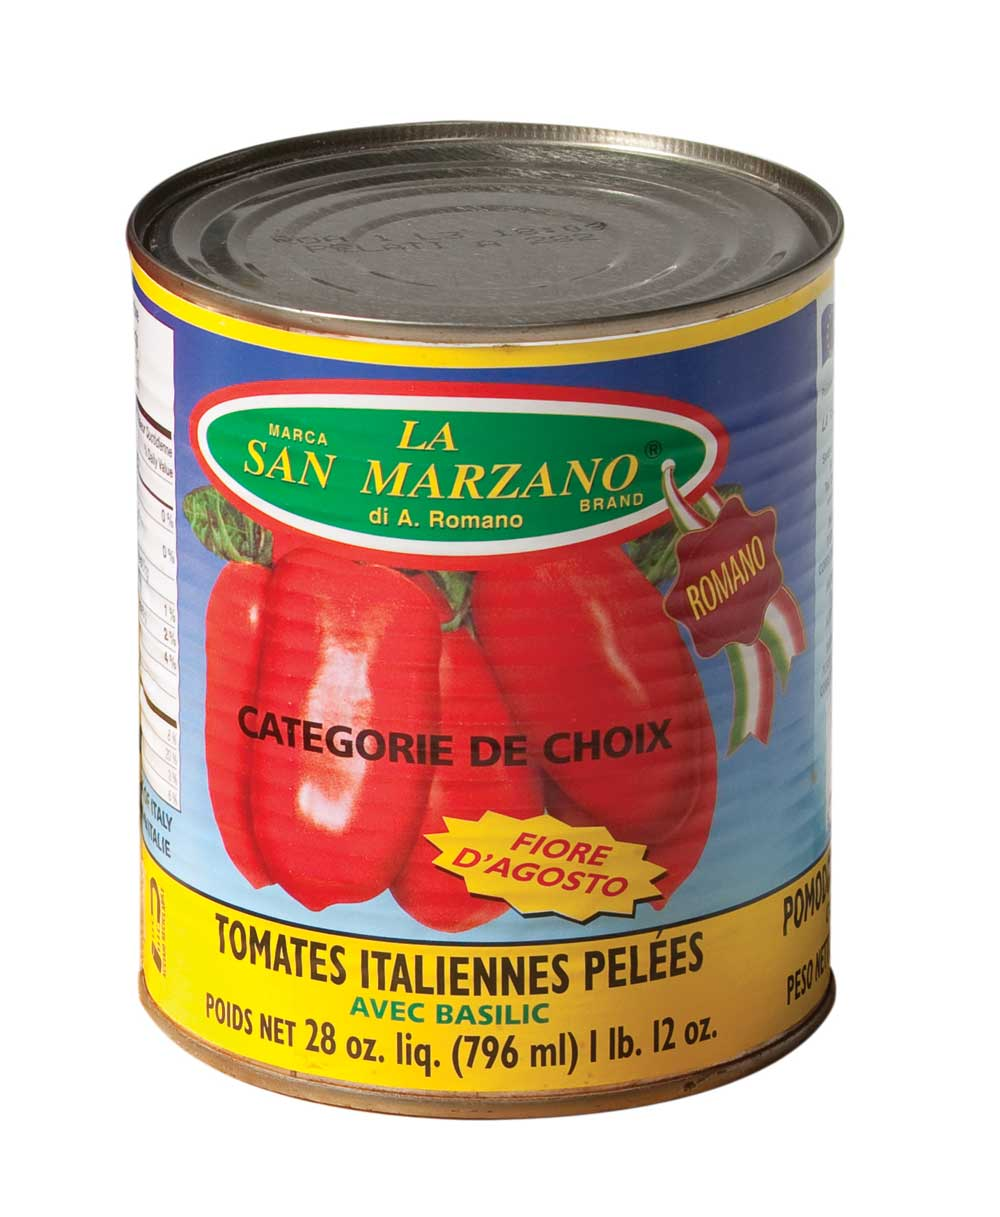 La tomate San Marzano